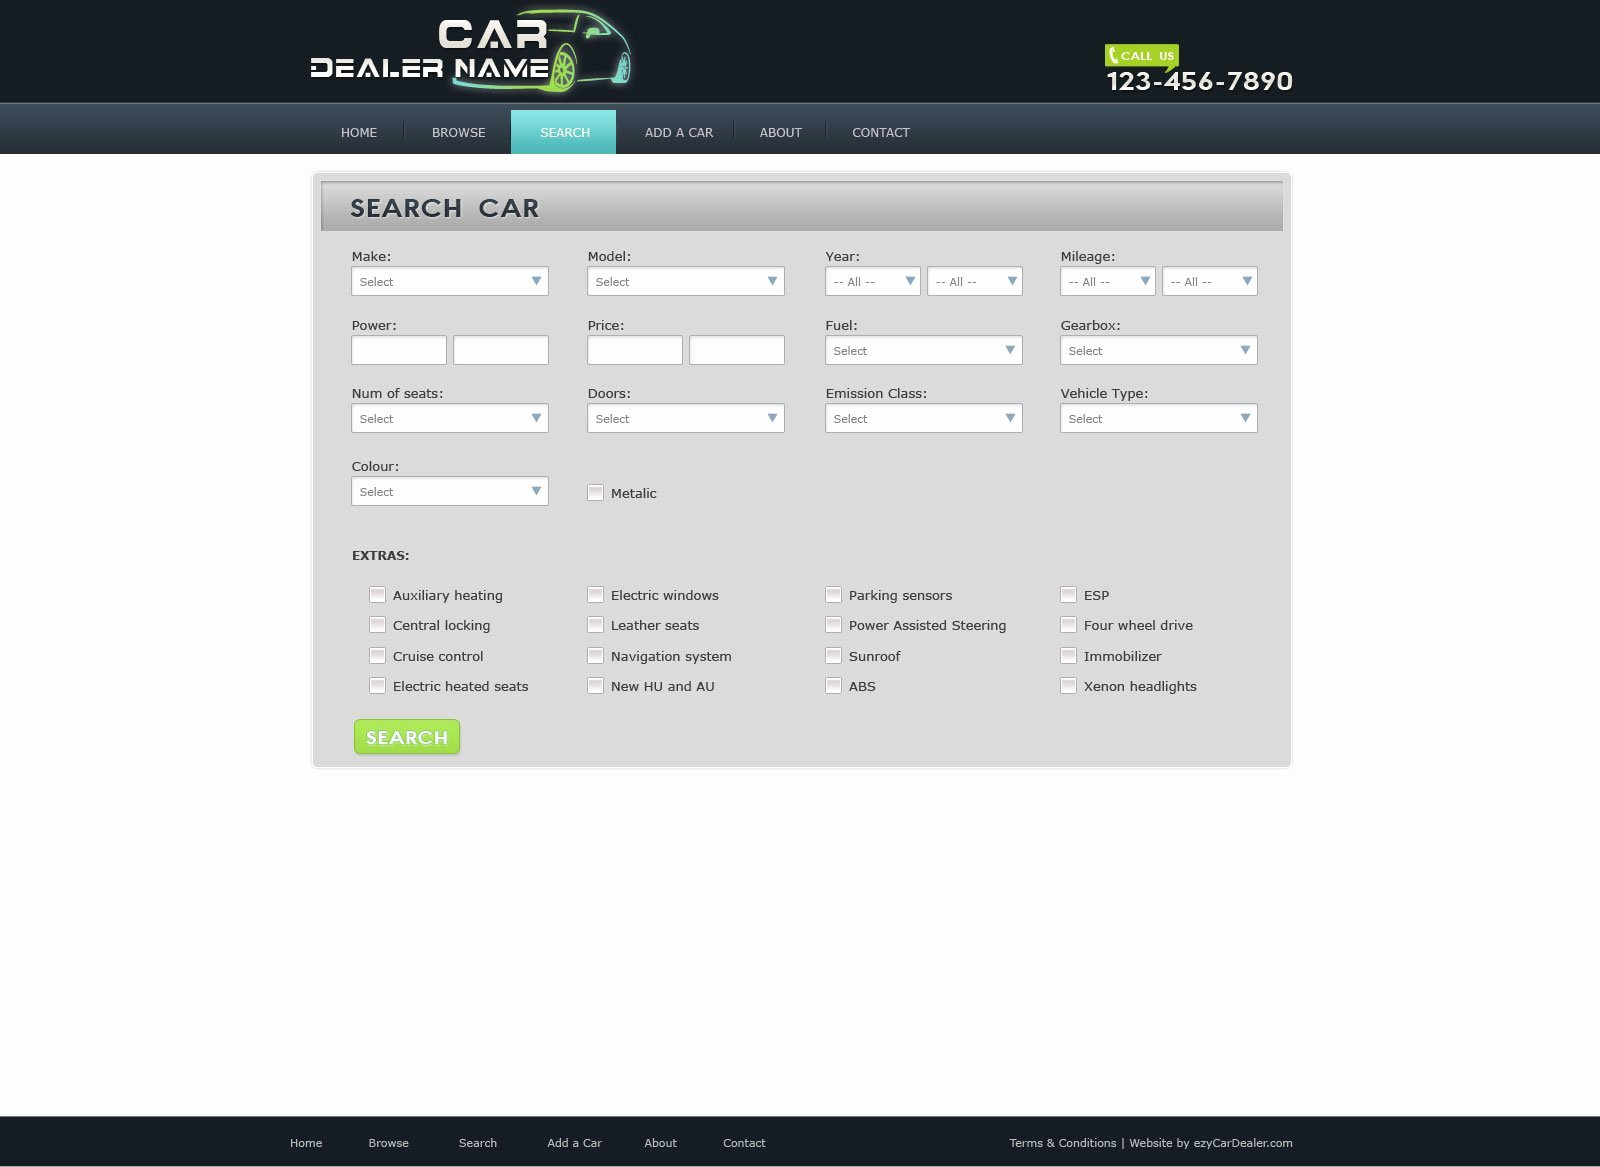 Car Dealer Website Template Free Inspirational Car Dealer Website Template